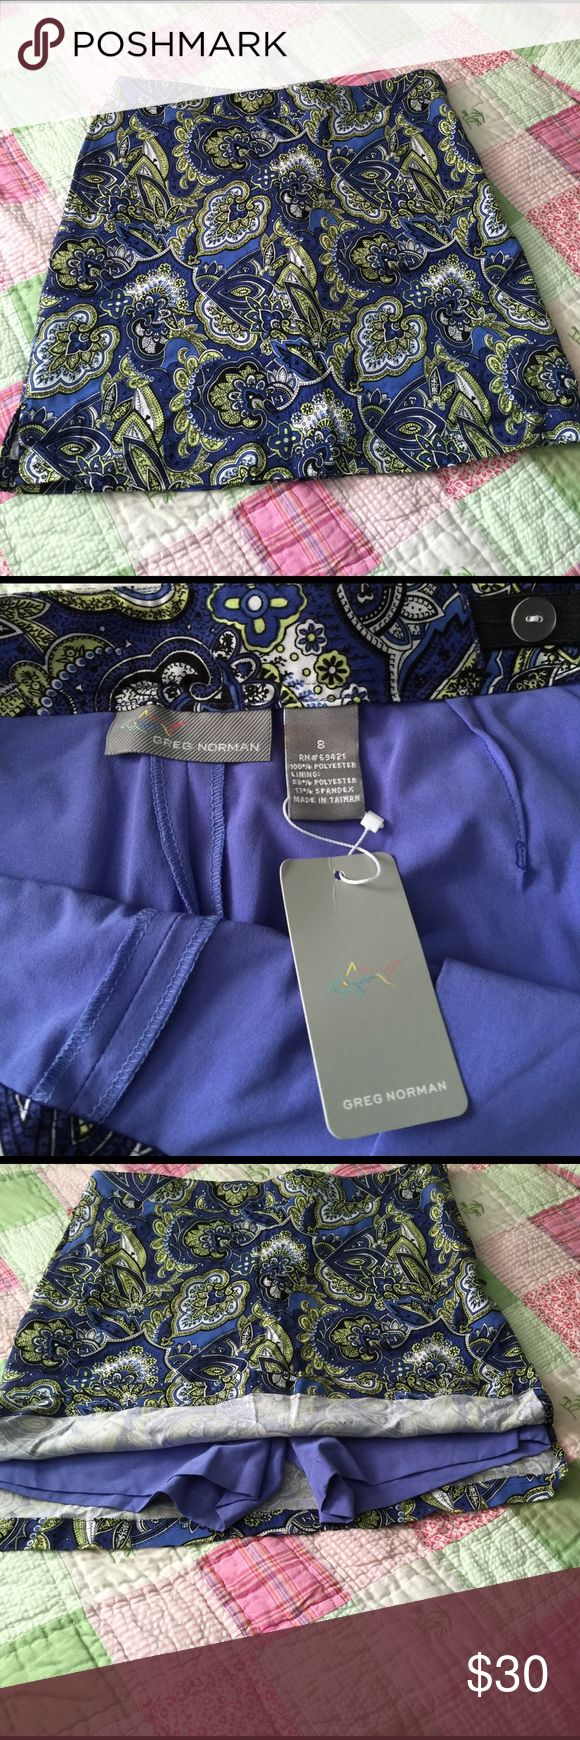 NEW Greg Norman Golf Skirt/Shorts NWT Greg Norman Ladies Paisley Golf Skirt/Shorts size 8 👩 Greg Norman Shorts Skorts